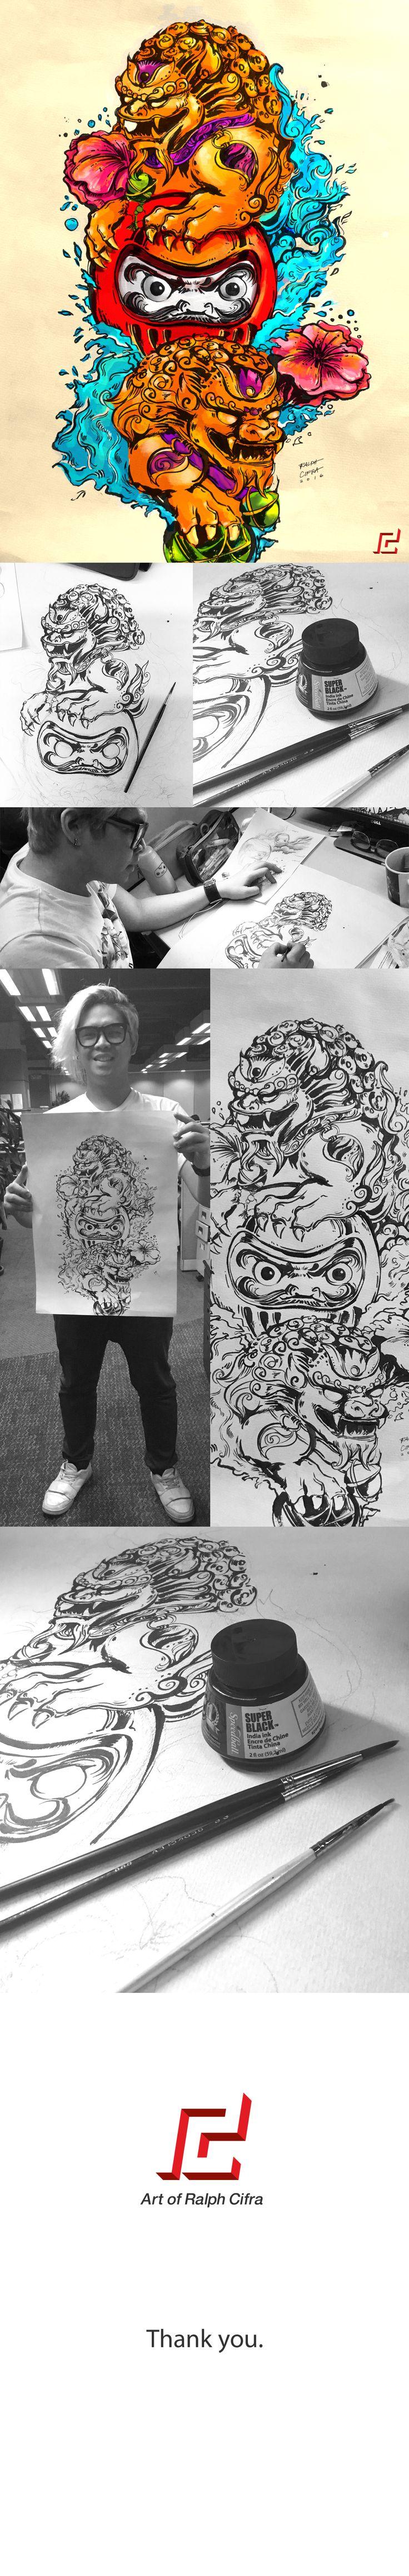 Guardian Lion and Daruma Doll Tattoo Design